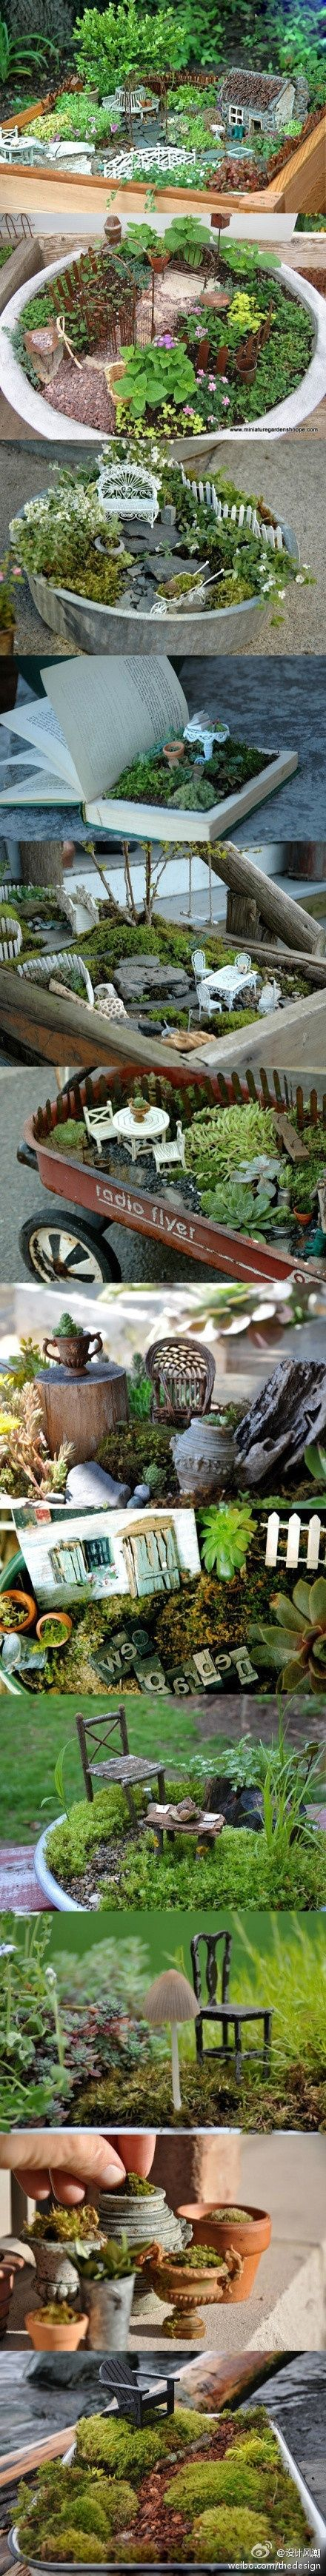 minature gardens                                                                                                                                                     More